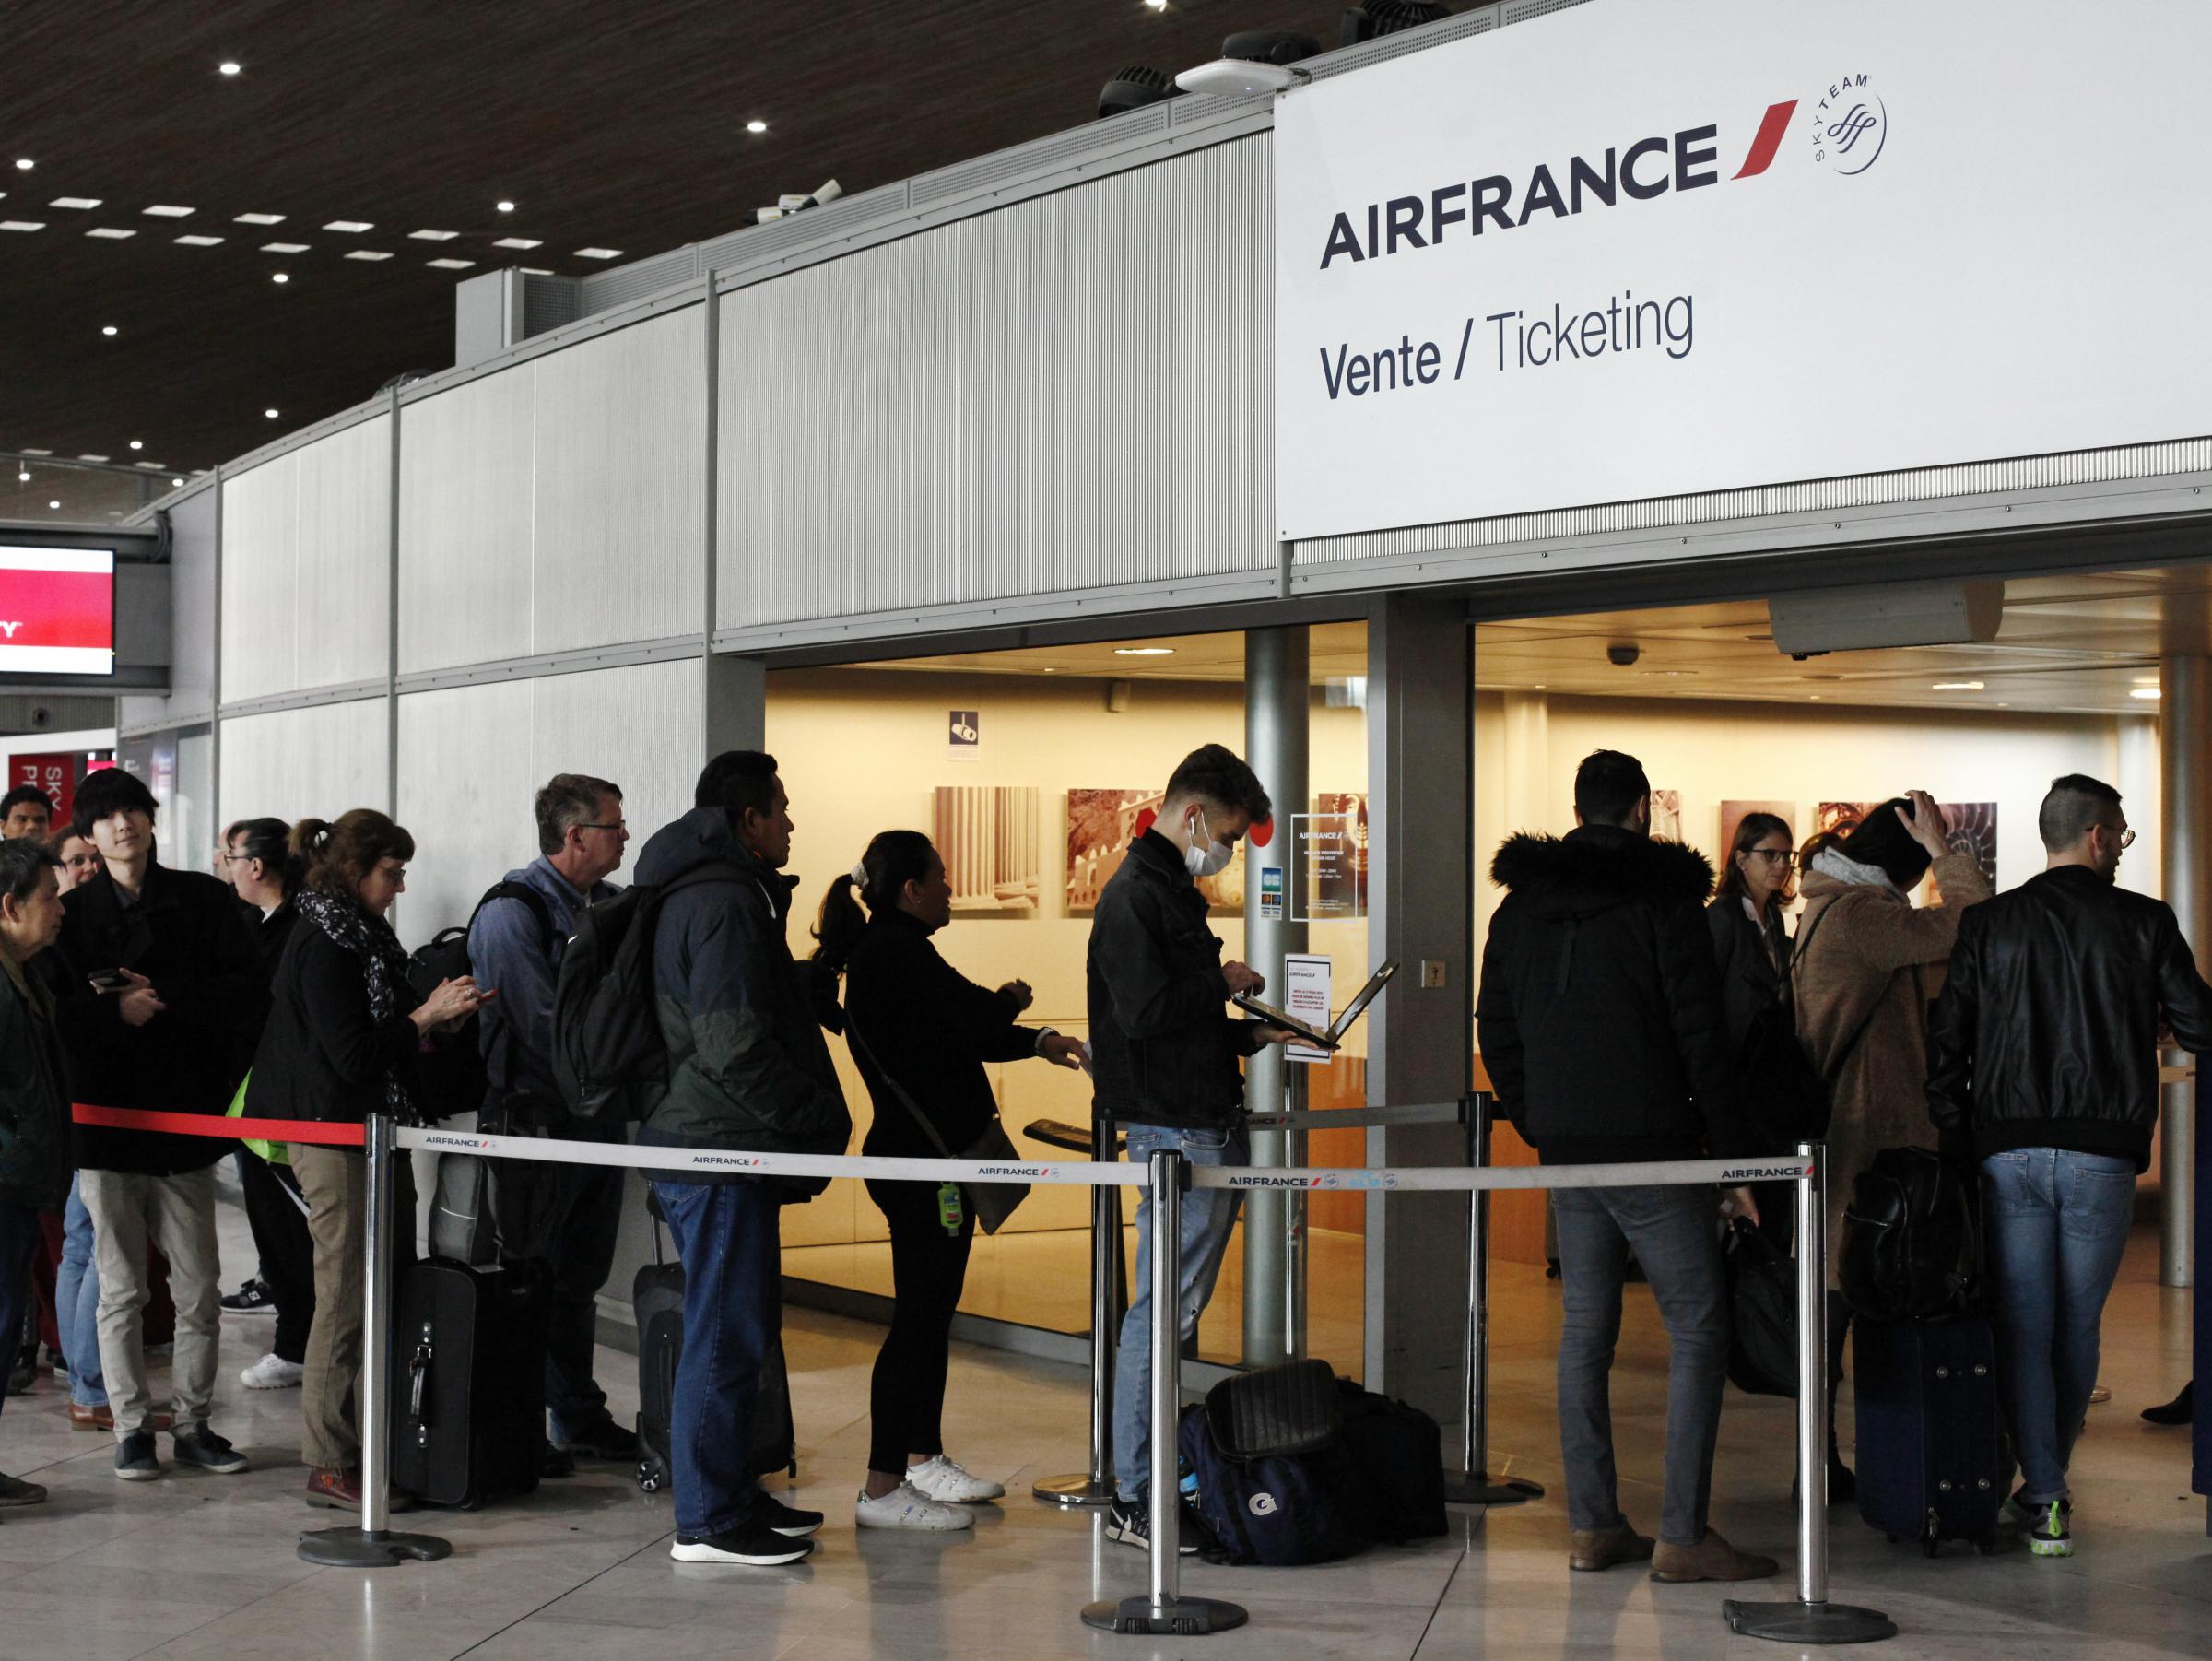 Trump Bans European Flights to U.S. Amid Coronavirus Pandemic